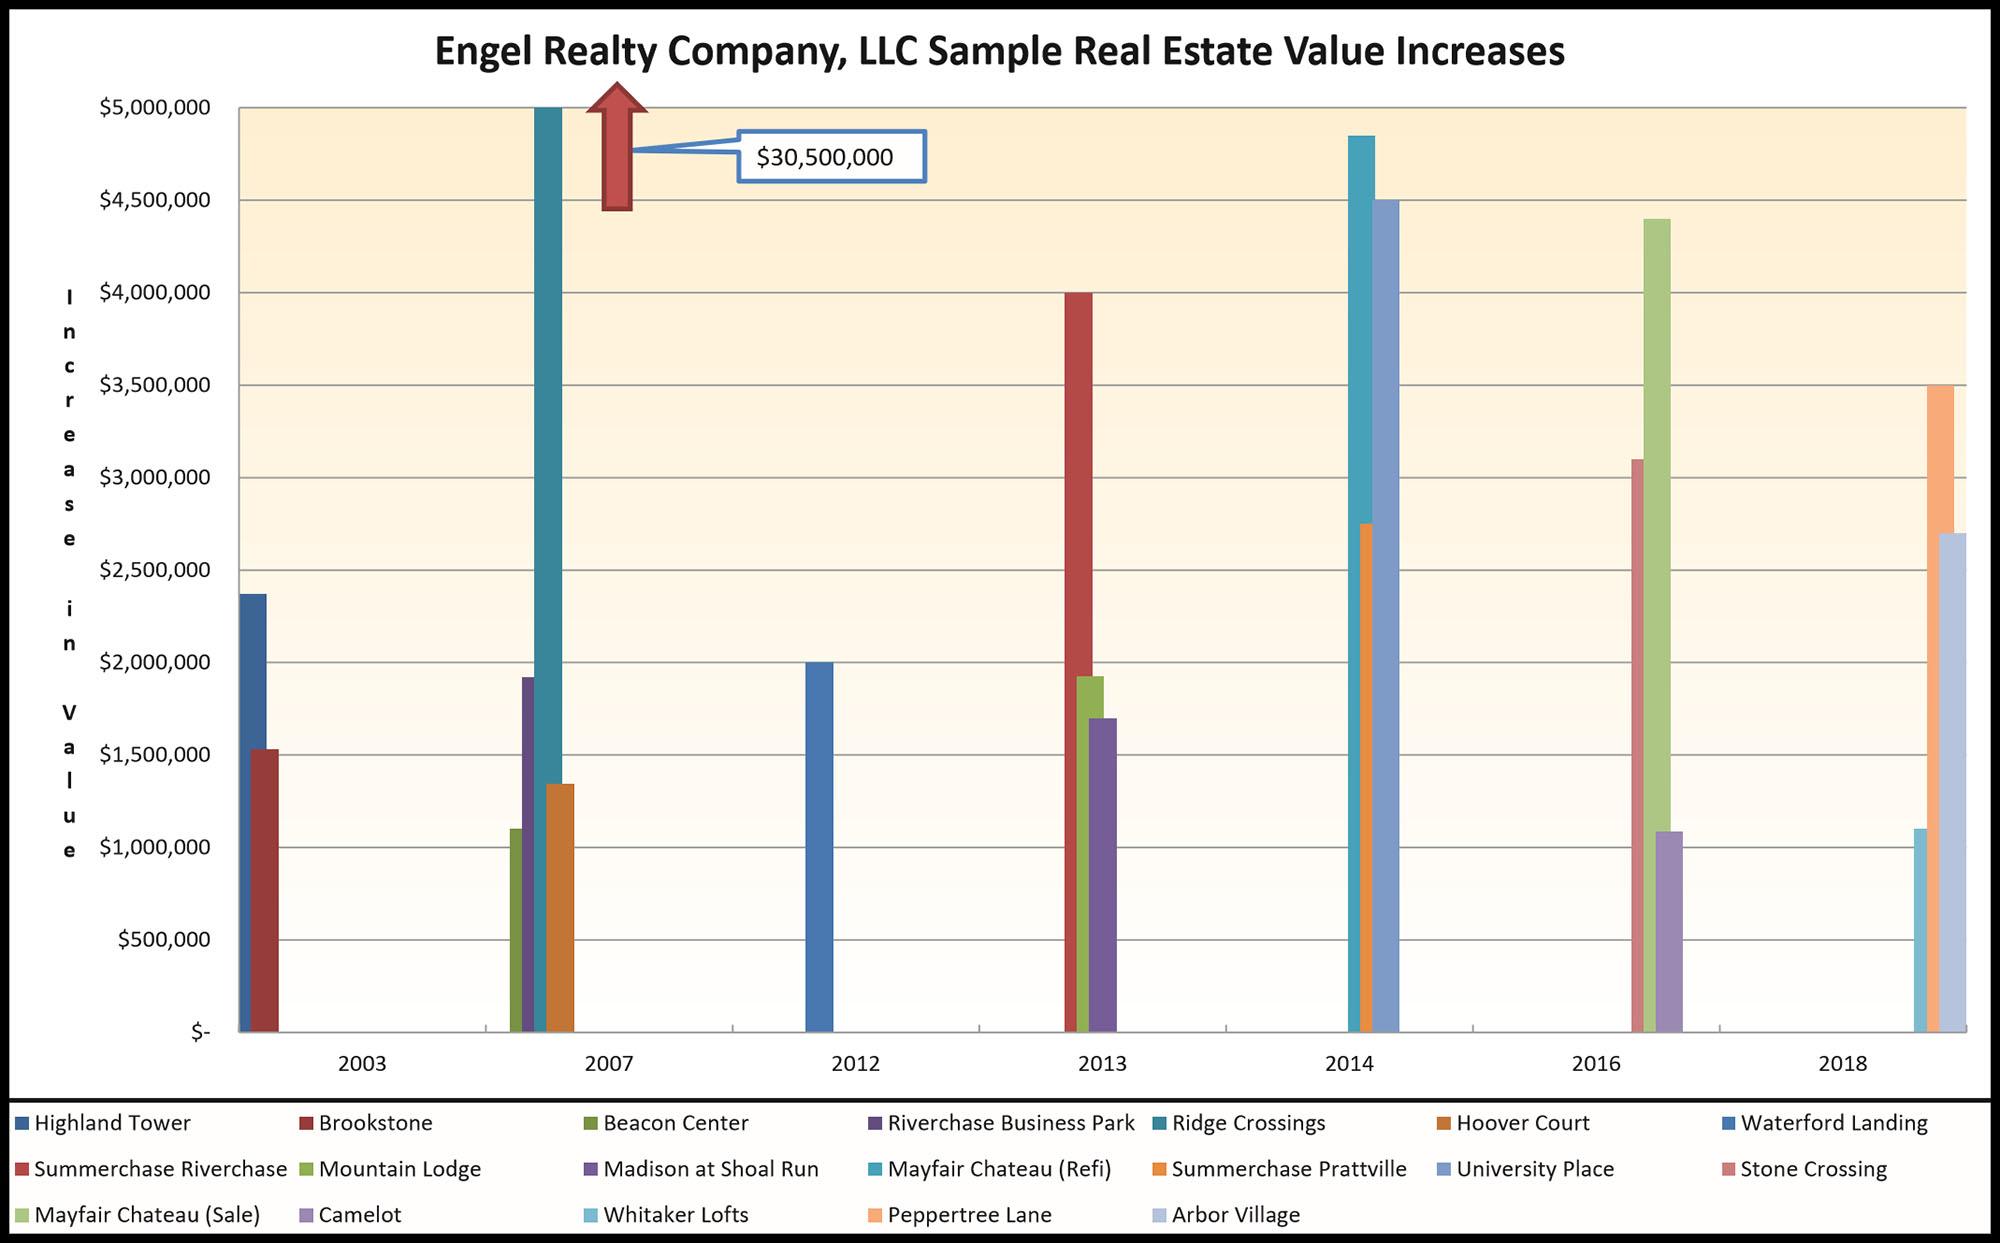 Engel Realty Company, LLC Sample Real Estate Value Increases